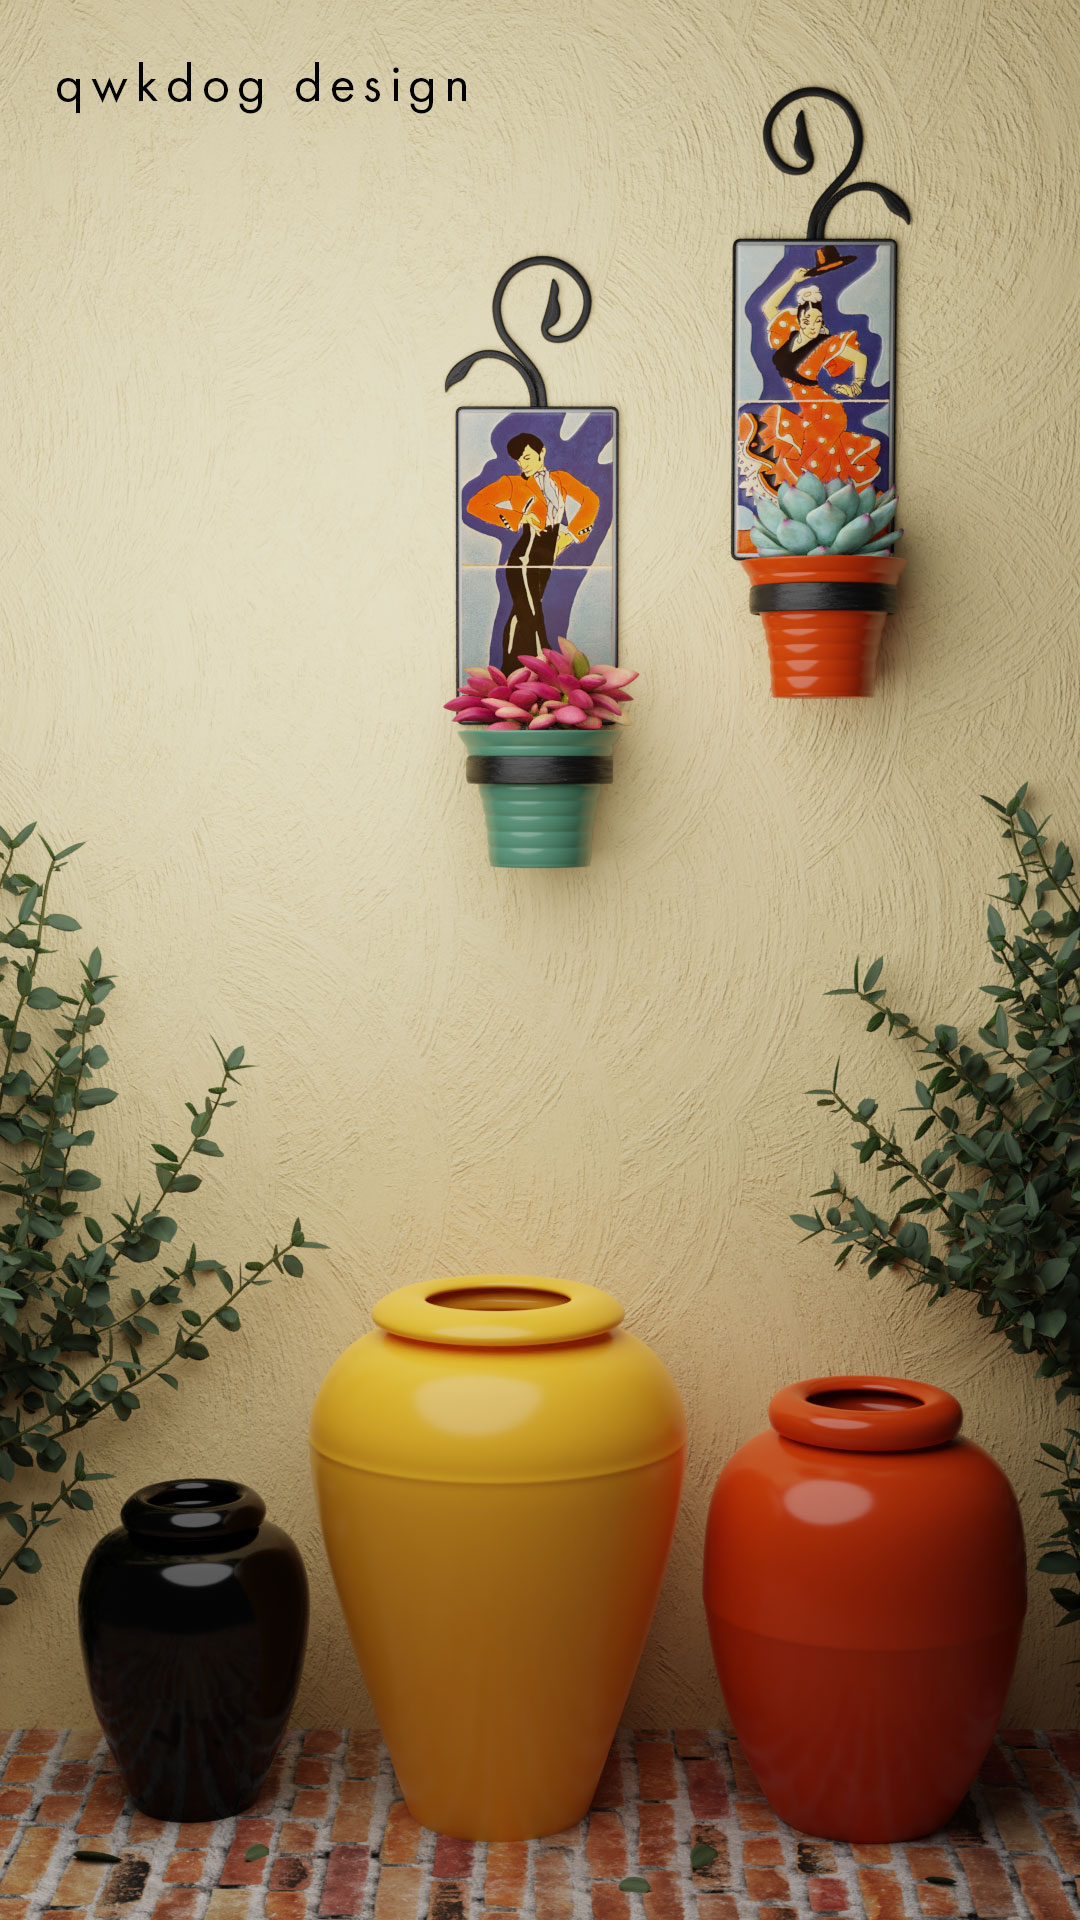 QwkDog 3D San Jose Pottery Tile